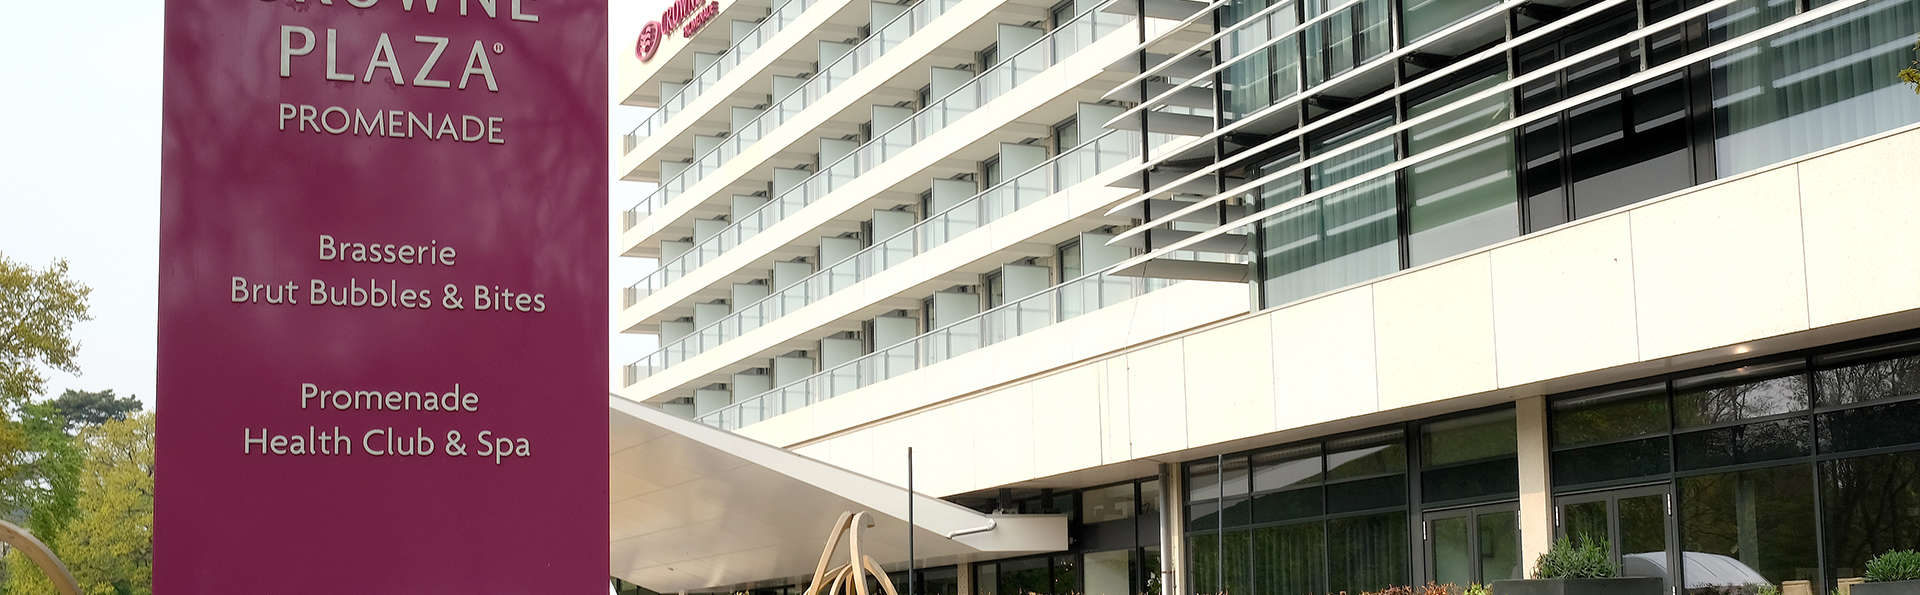 Crowne Plaza Den Haag - Promenade Hotel - EDIT_NEW_front2.jpg